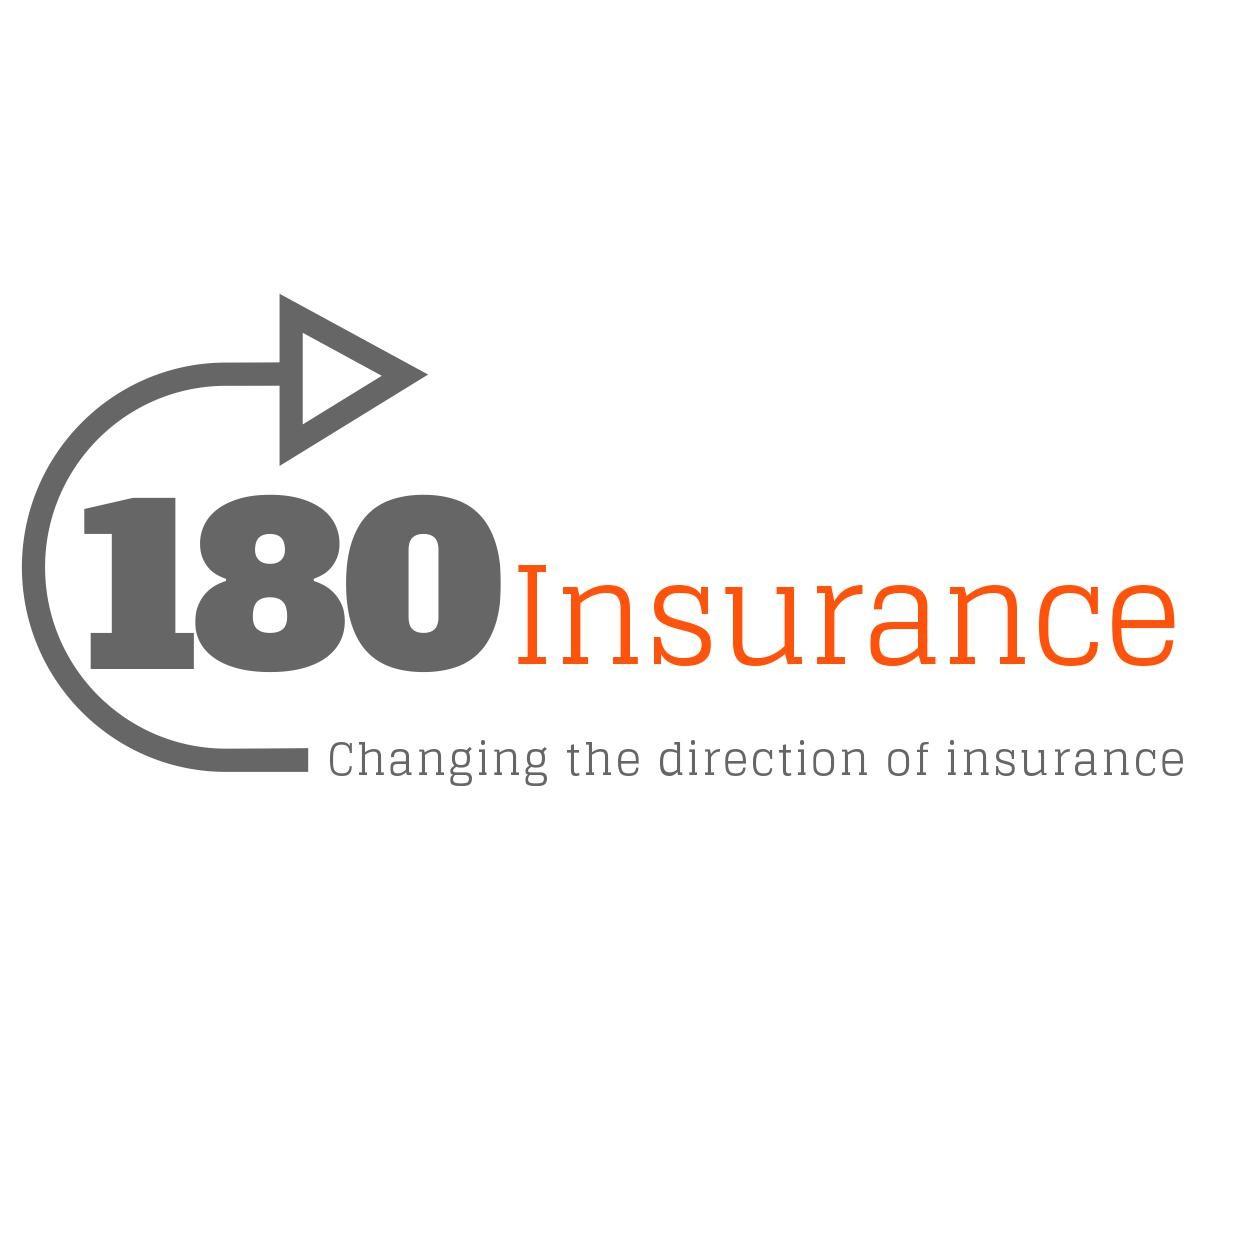 180 Insurance